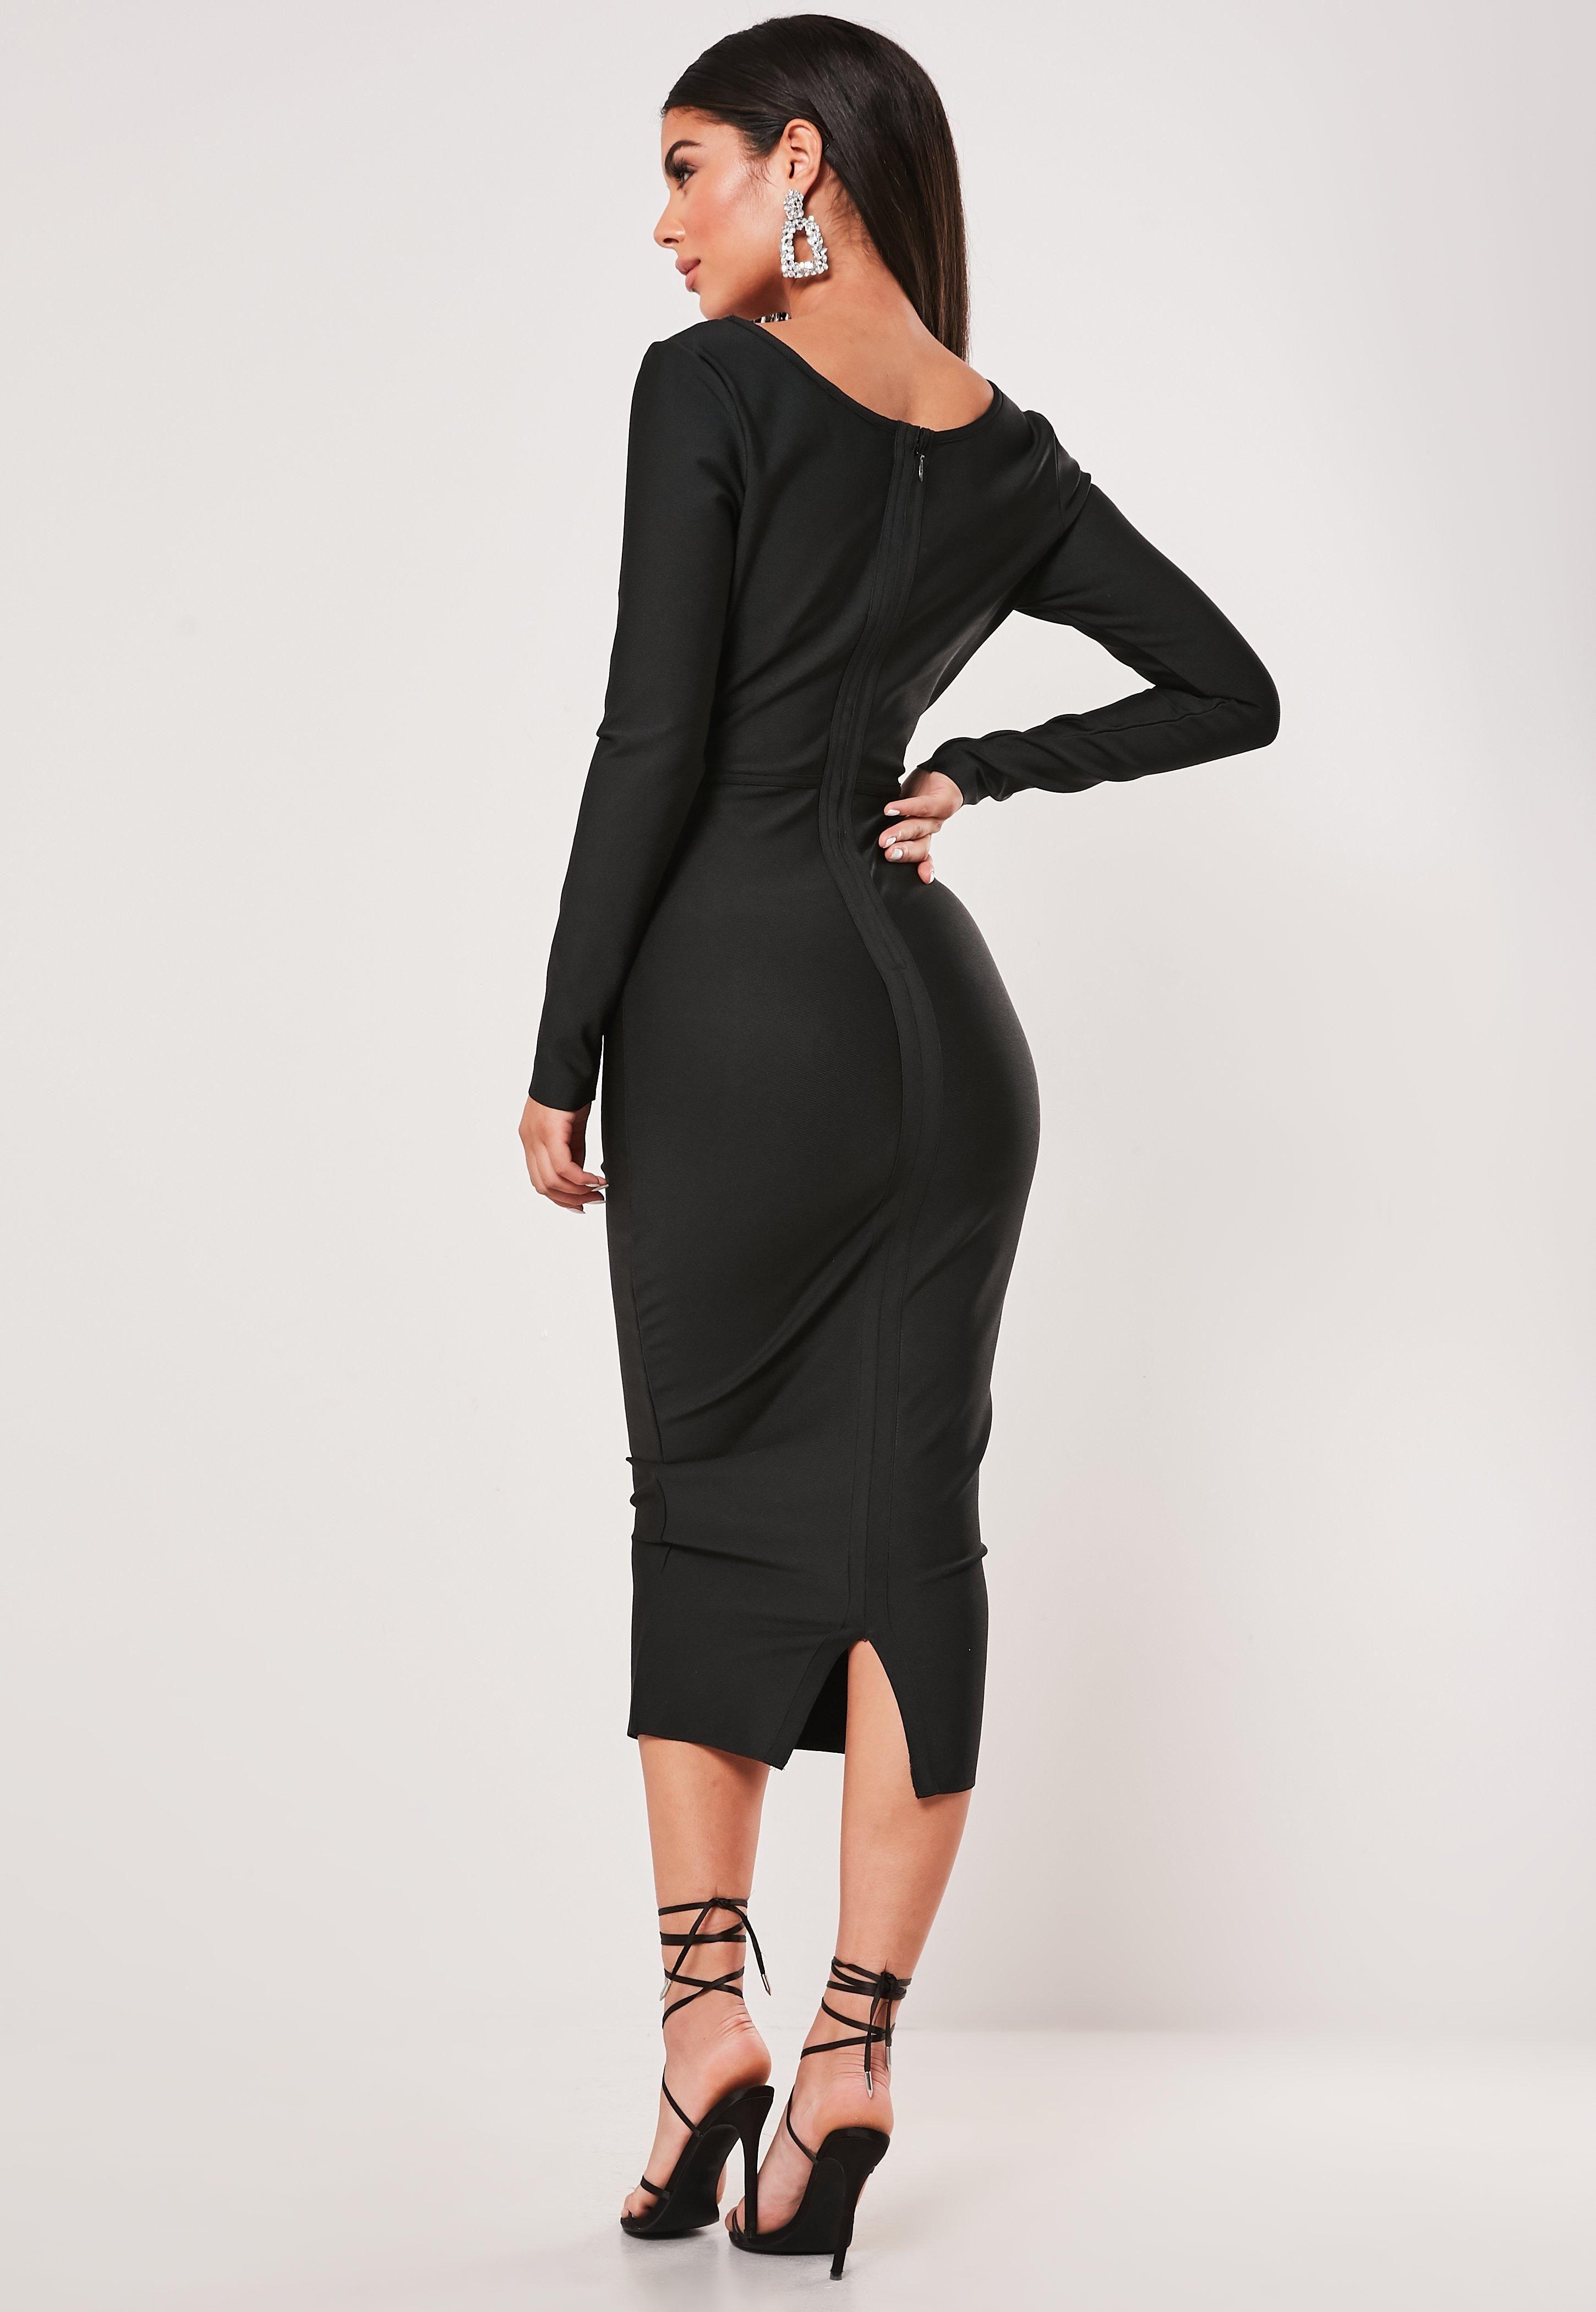 Premium Black Long Sleeve Bandage Corset Midi Dress Sponsored Long Affiliate Sleeve Premium Long Sleeve Bandage Dress Corset Midi Dress Petite Outfits [ 4200 x 2900 Pixel ]